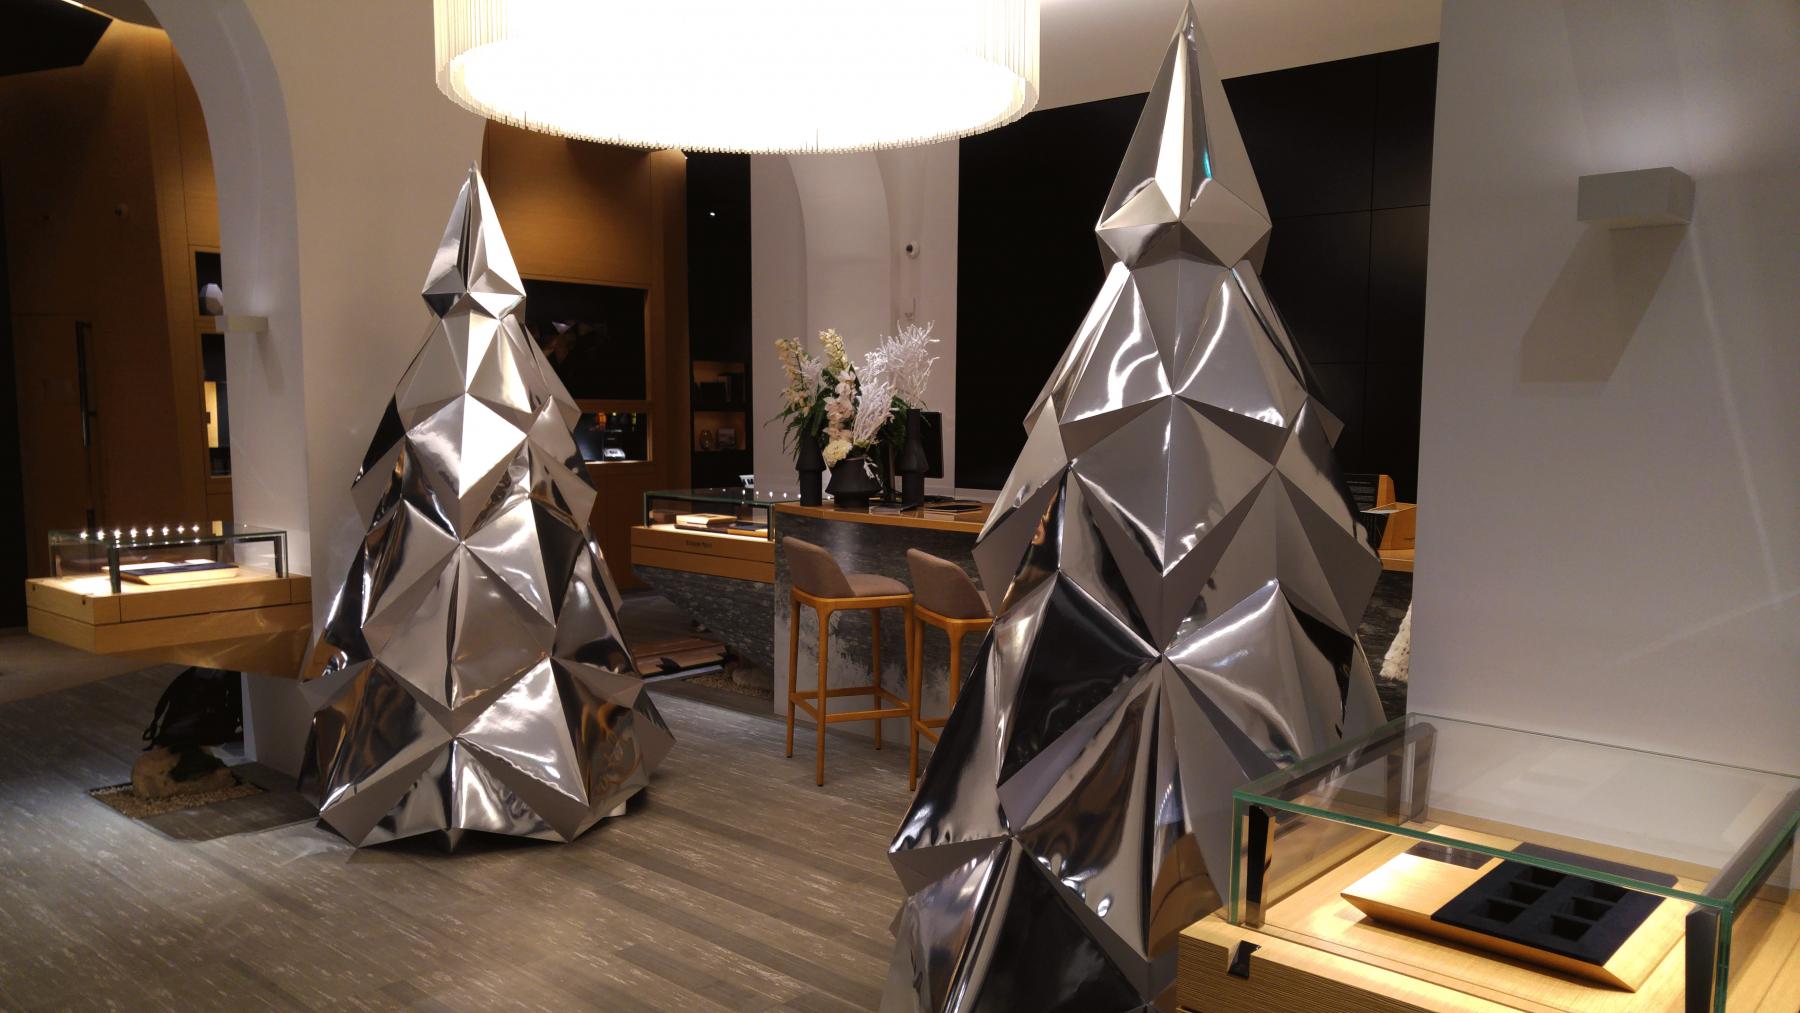 Paper Papier Sapin Christmas Tree Low Poly Audemars Piguet